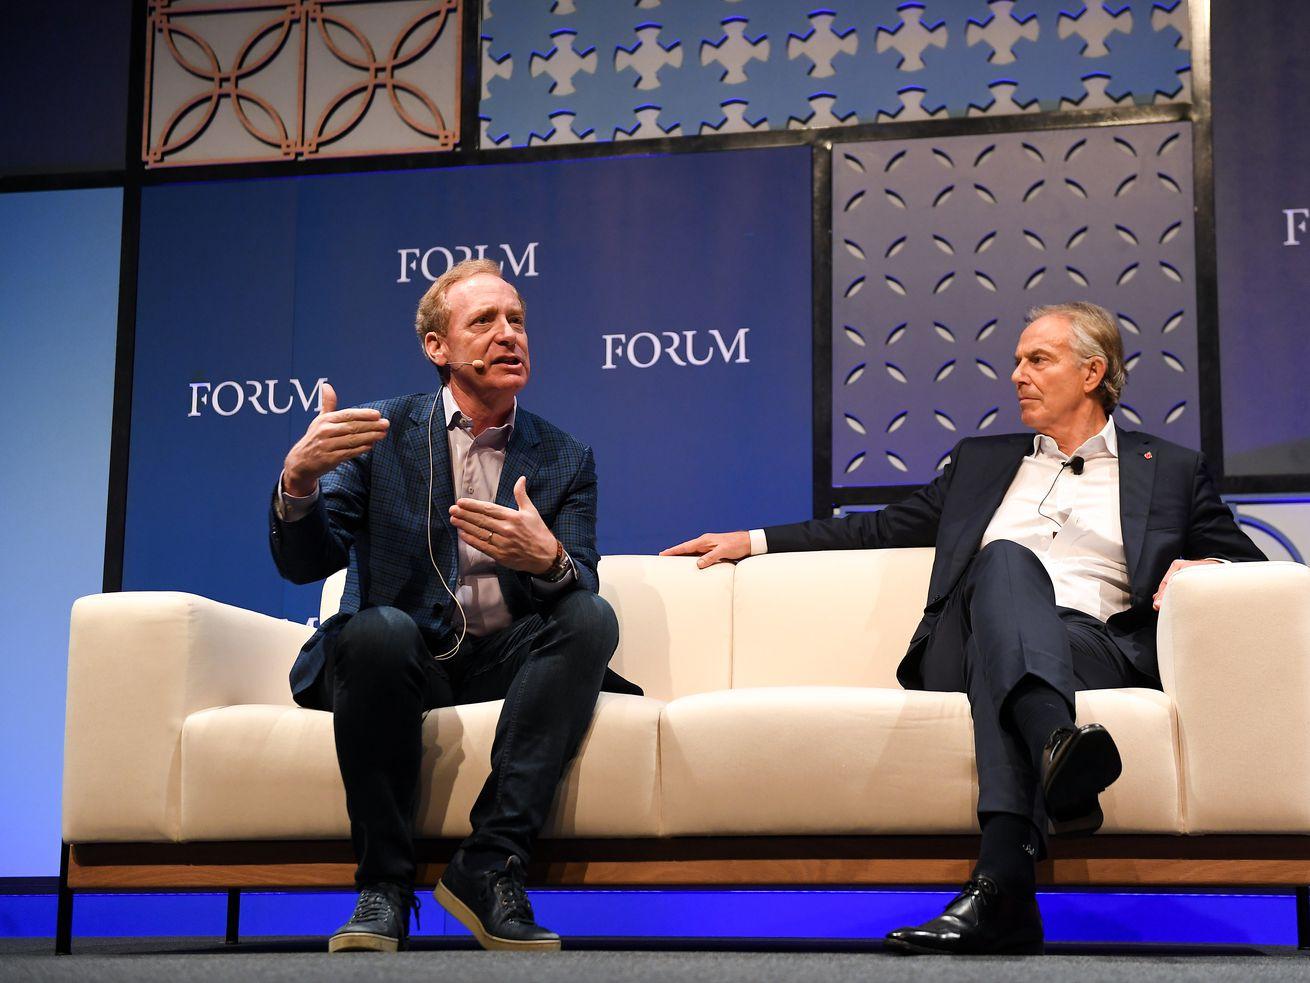 Brad Smith, left, and former British Prime Minister Tony Blair